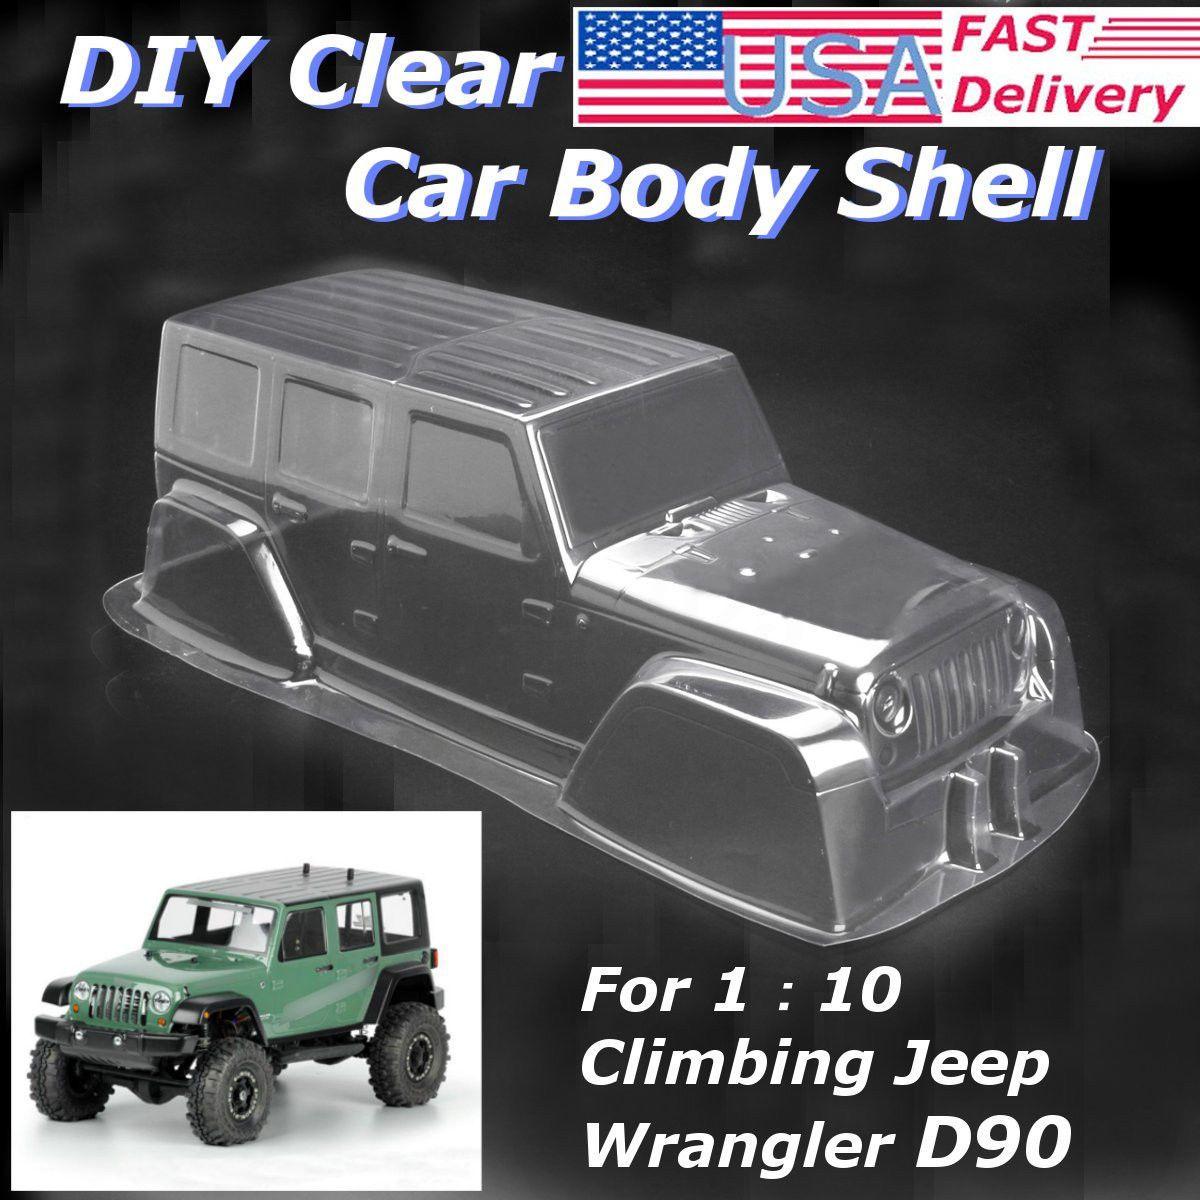 Axial RC Scale Truck Body Shell 1//10 JEEP WRANGLER RUBICON Hard Body w// INTERIOR